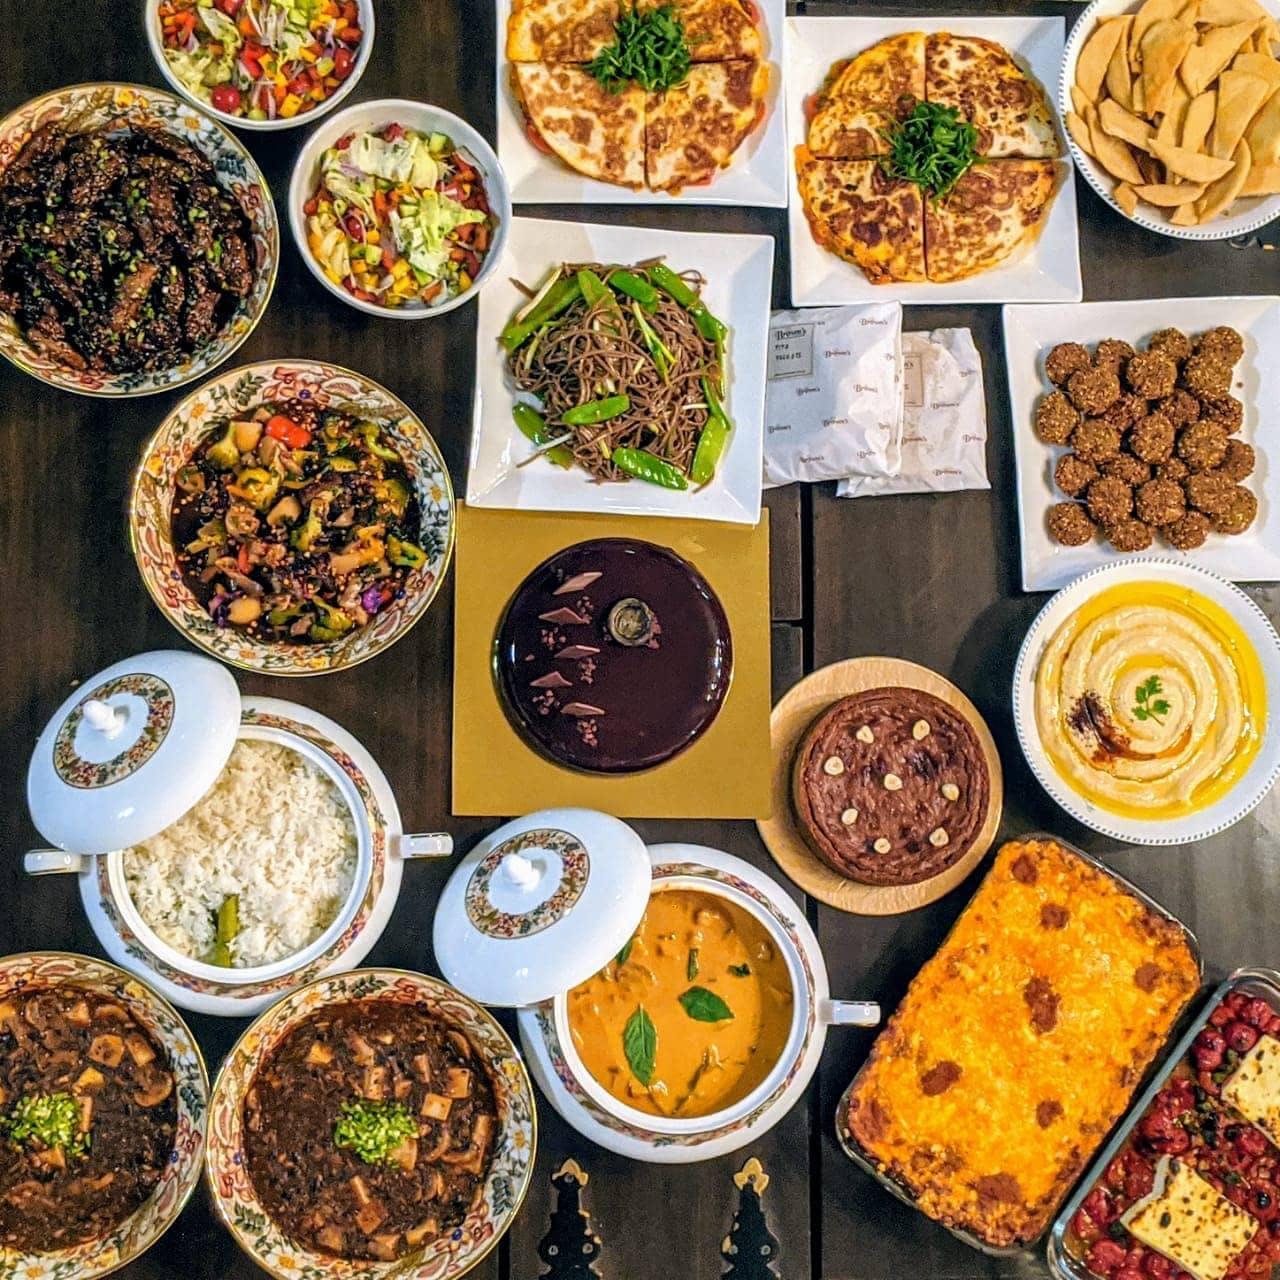 Dish,Food,Cuisine,Meal,Ingredient,Produce,Vegetarian food,Comfort food,Lunch,Side dish